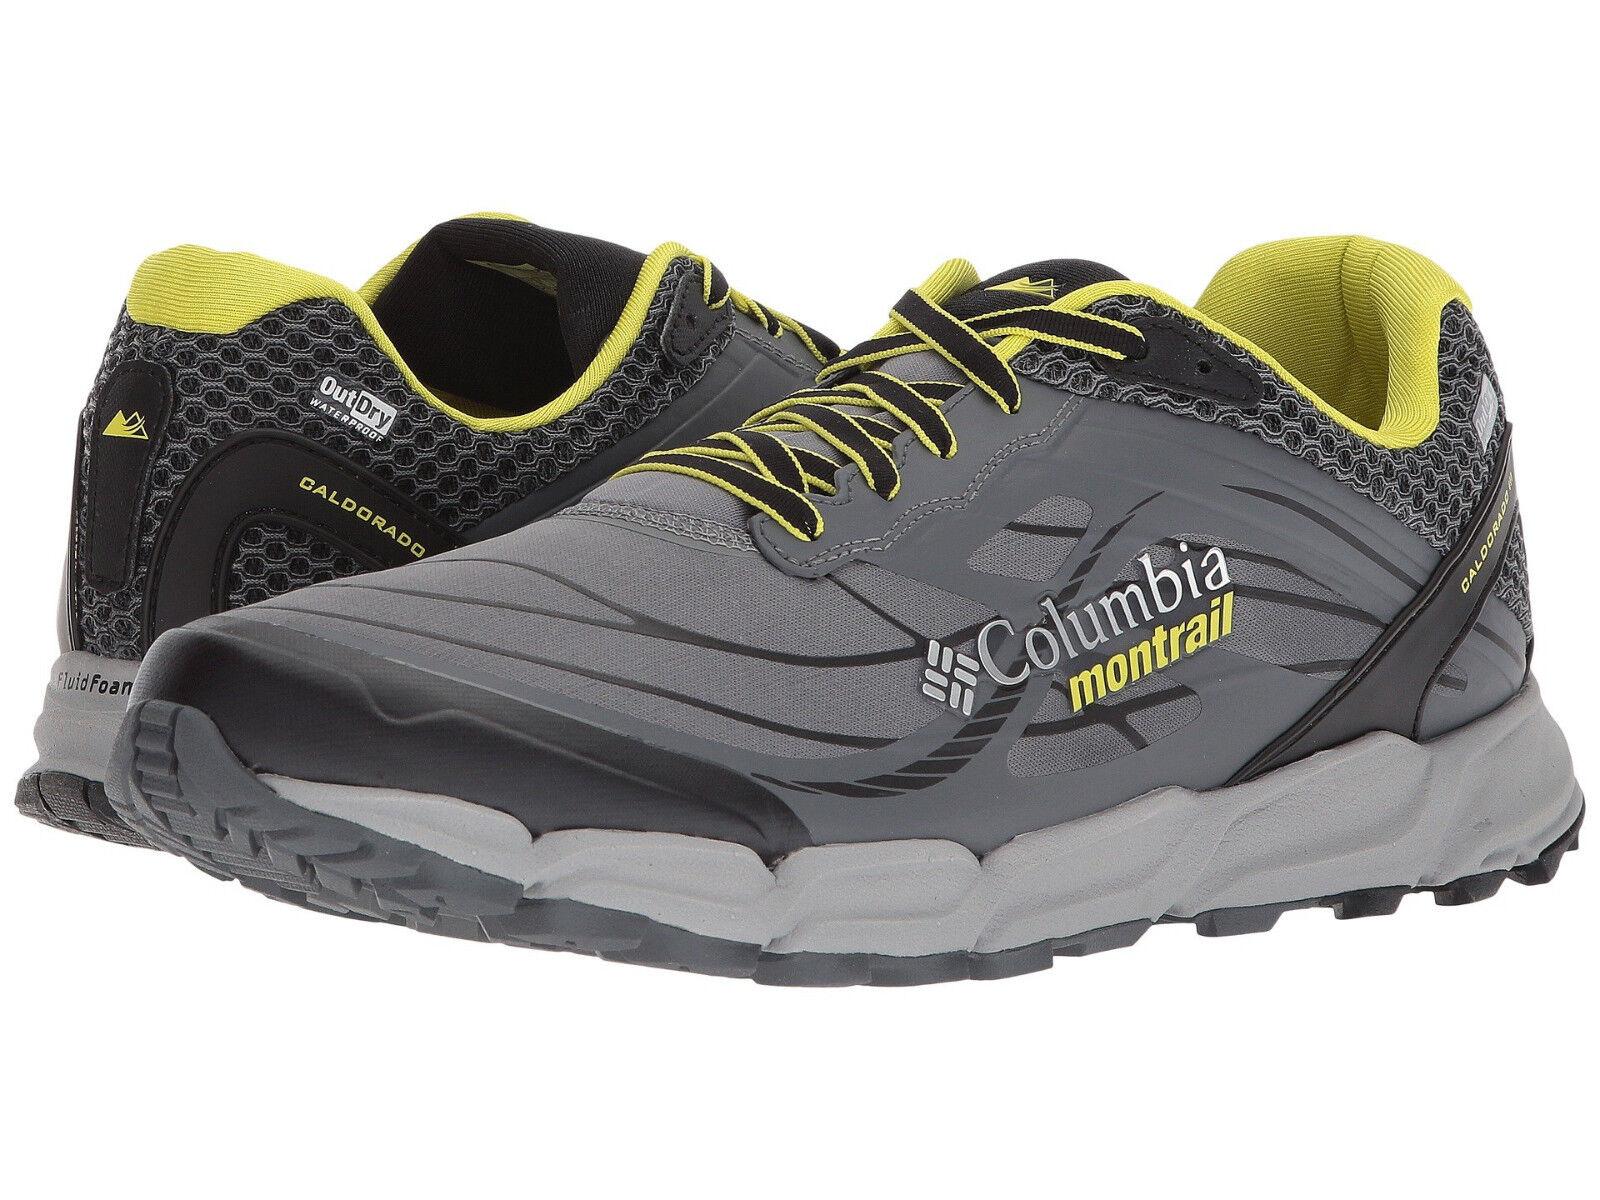 Columbia Men's Caldorado US 14 M Grey Synthetic Running Sneakers Shoes 145.00